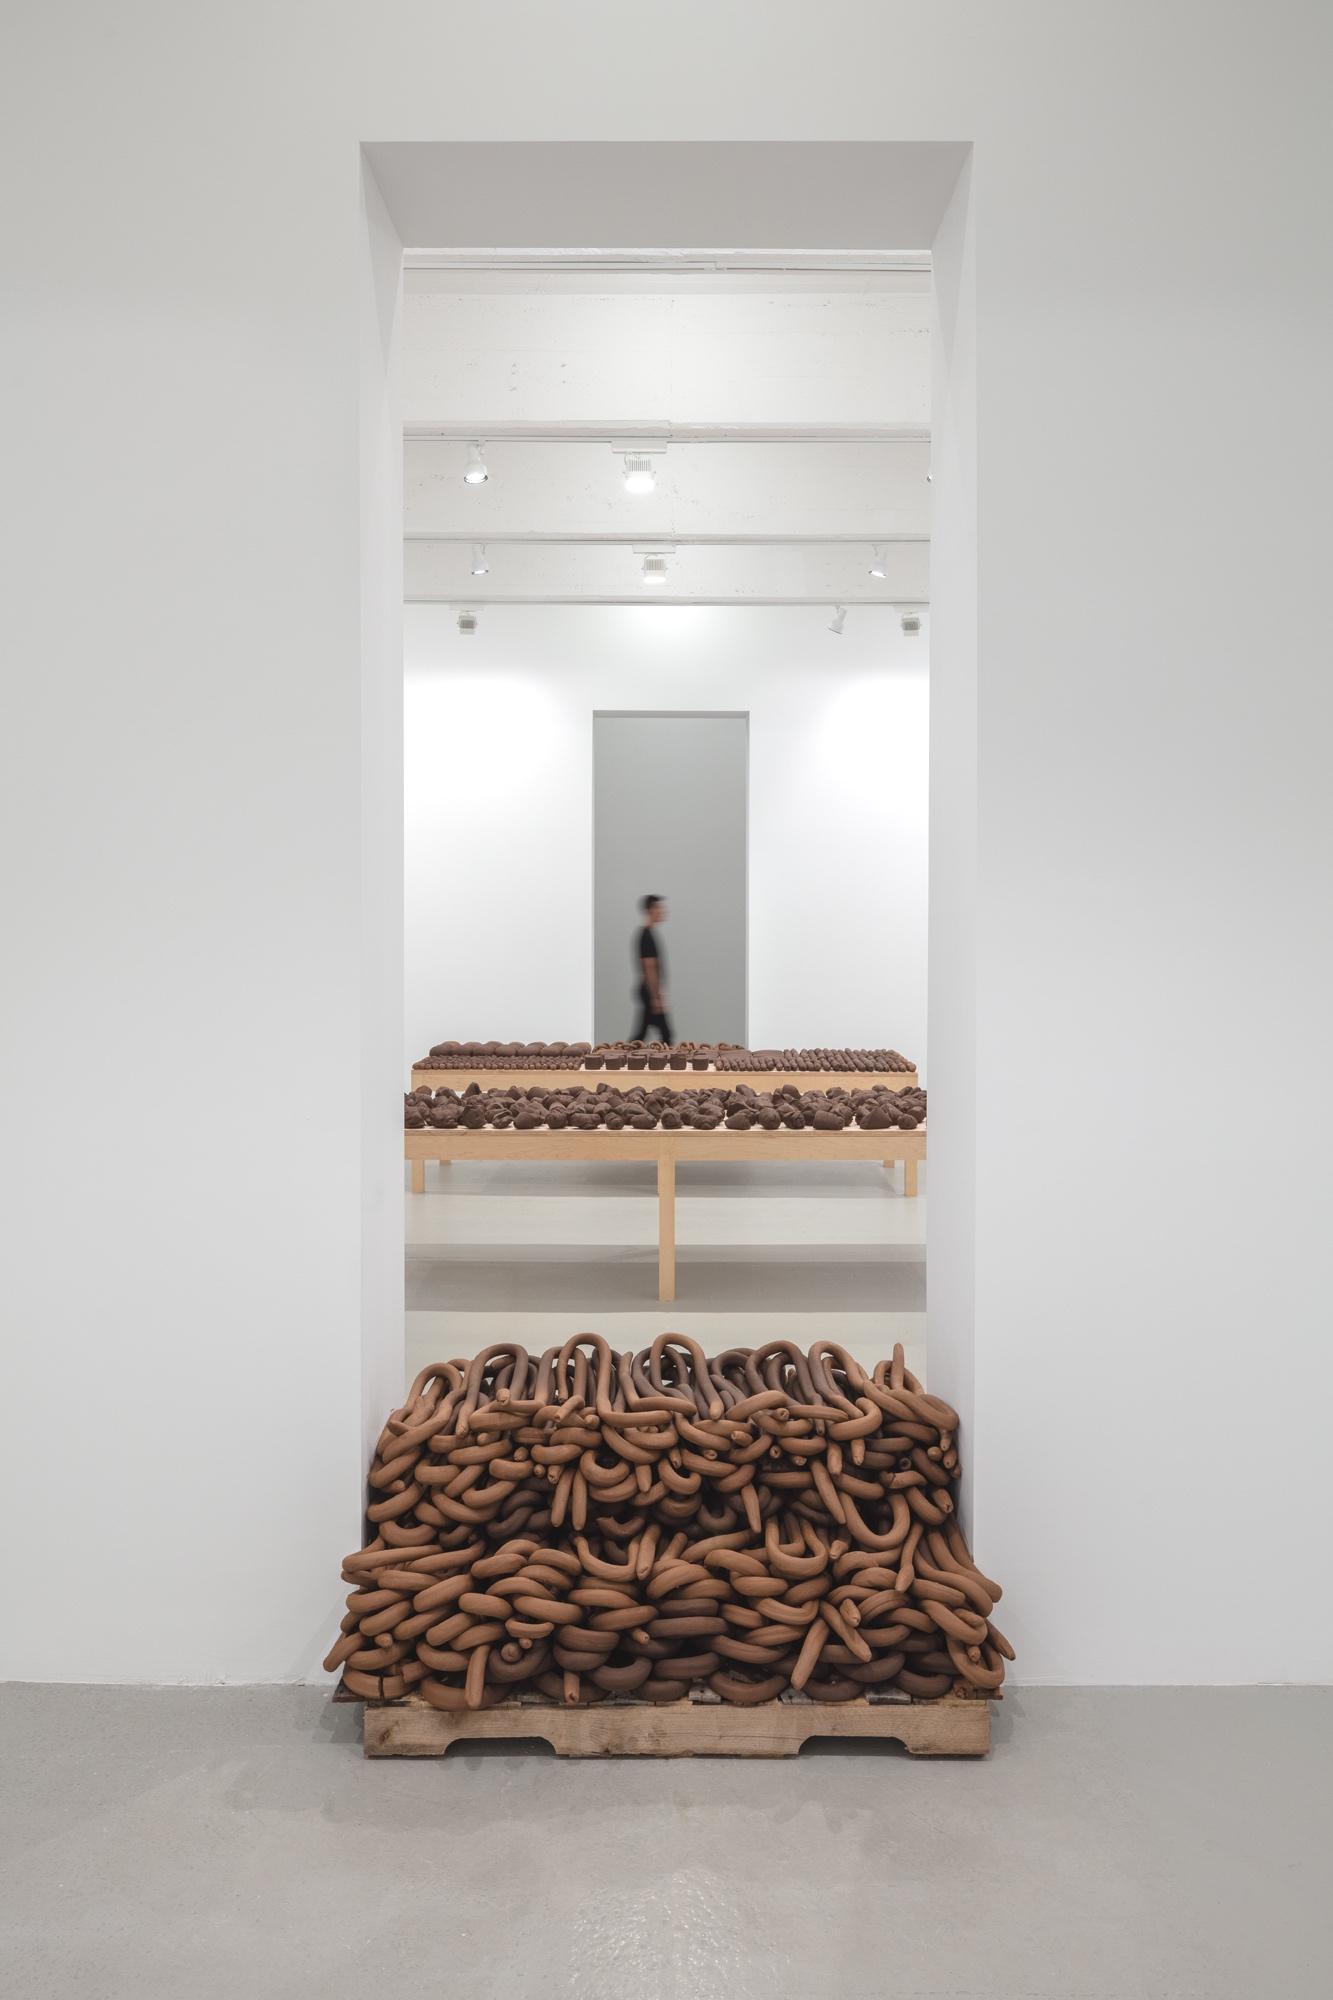 Art / Installations  ERRÂNCIA POÉTICA (POETIC WANDERINGS) Anna Maria Maiolino Hauser & Wirth